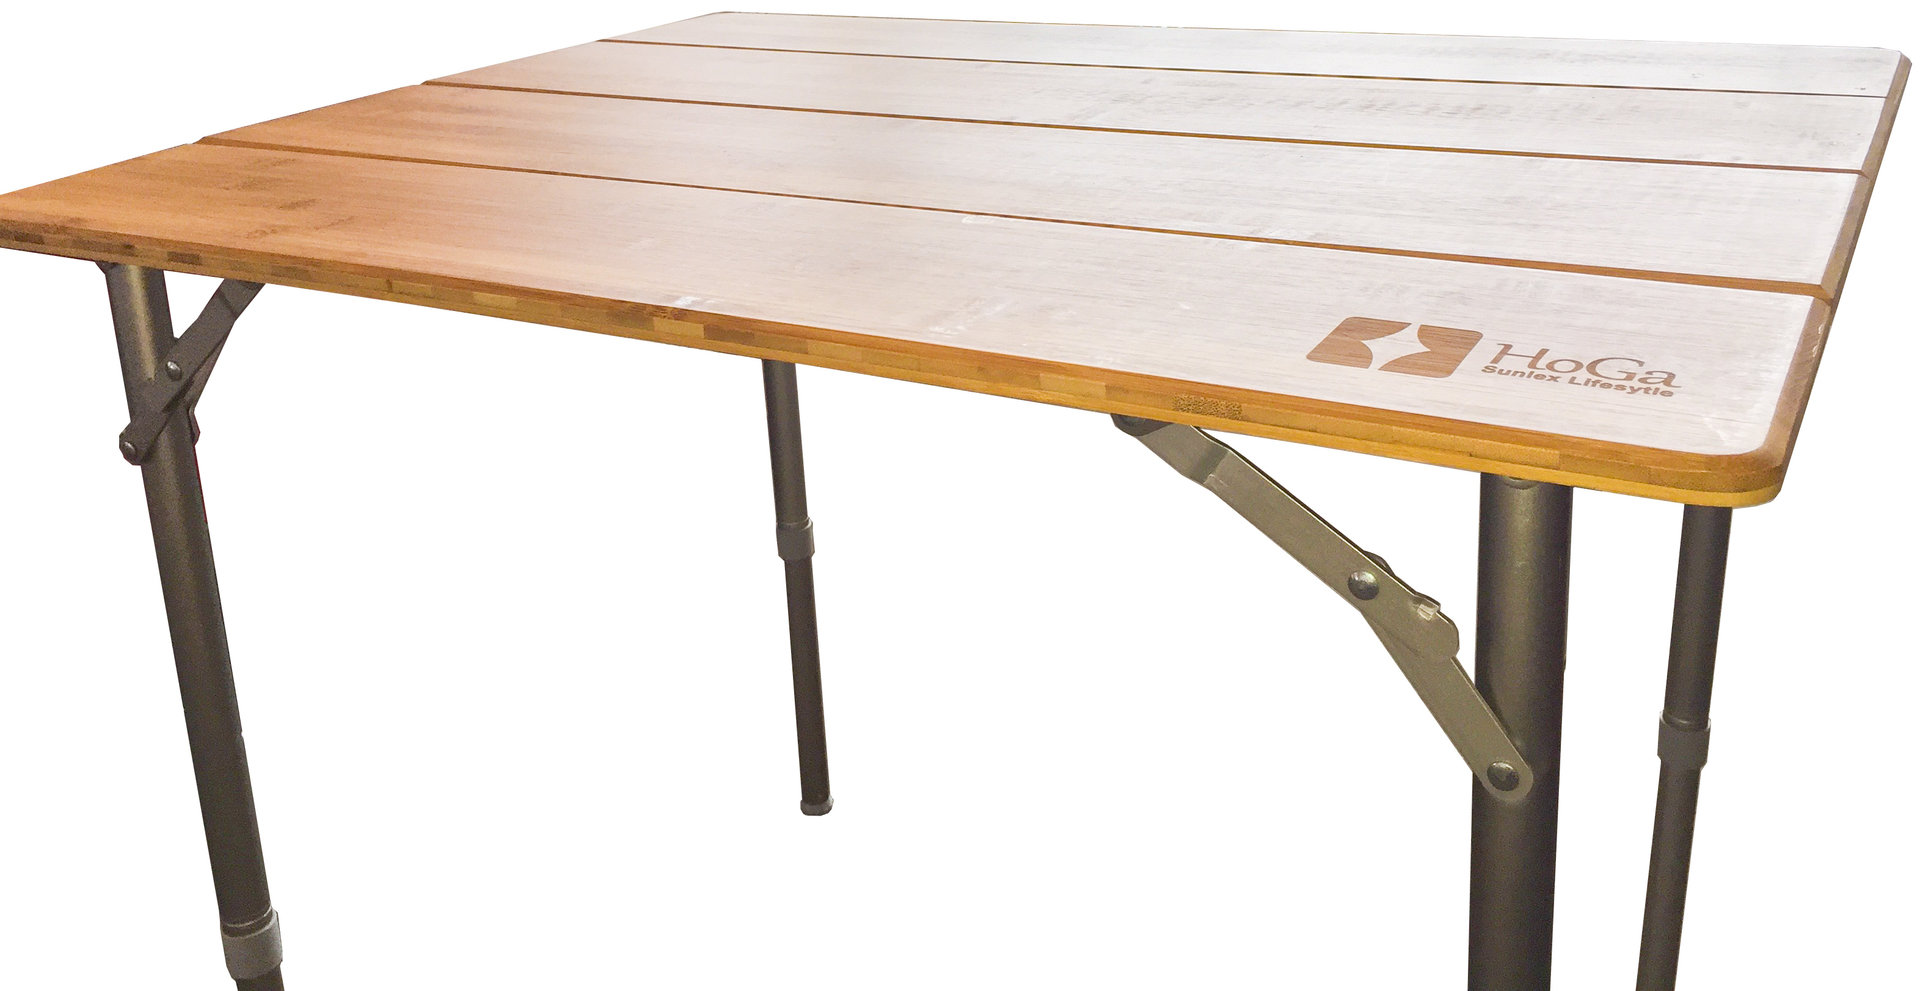 HoGa Sunlex PIKO Bambus Alu Tisch Klapptisch Campingtisch GF14